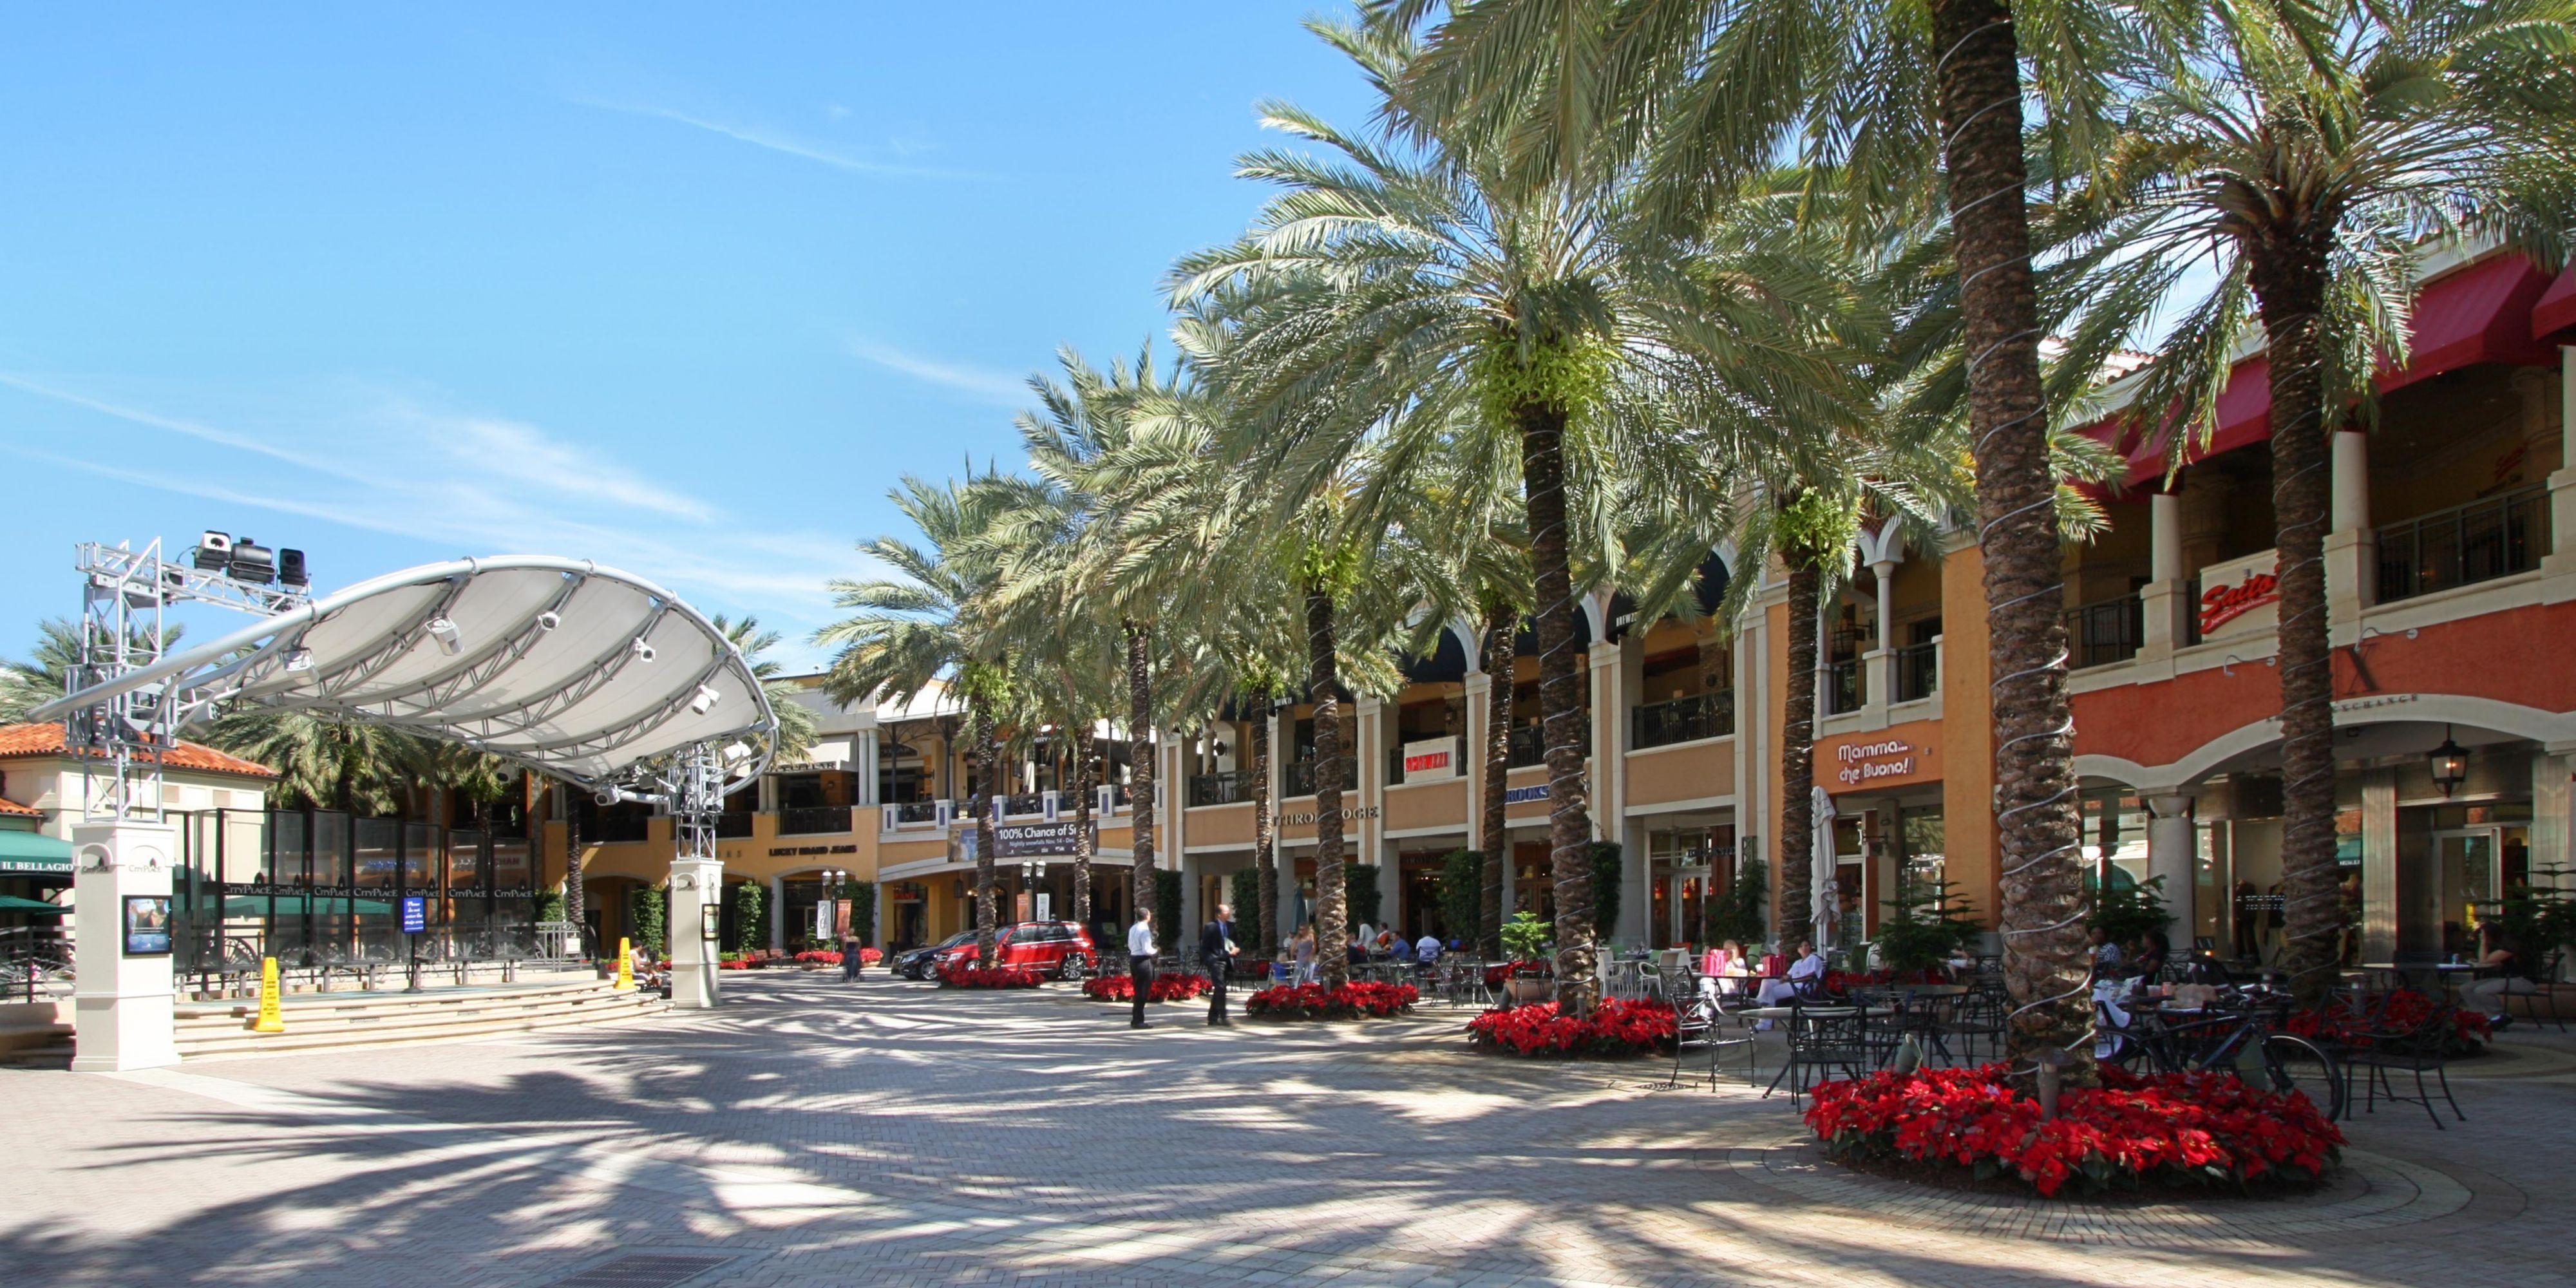 hastighet dating i vest Palm Beach FL